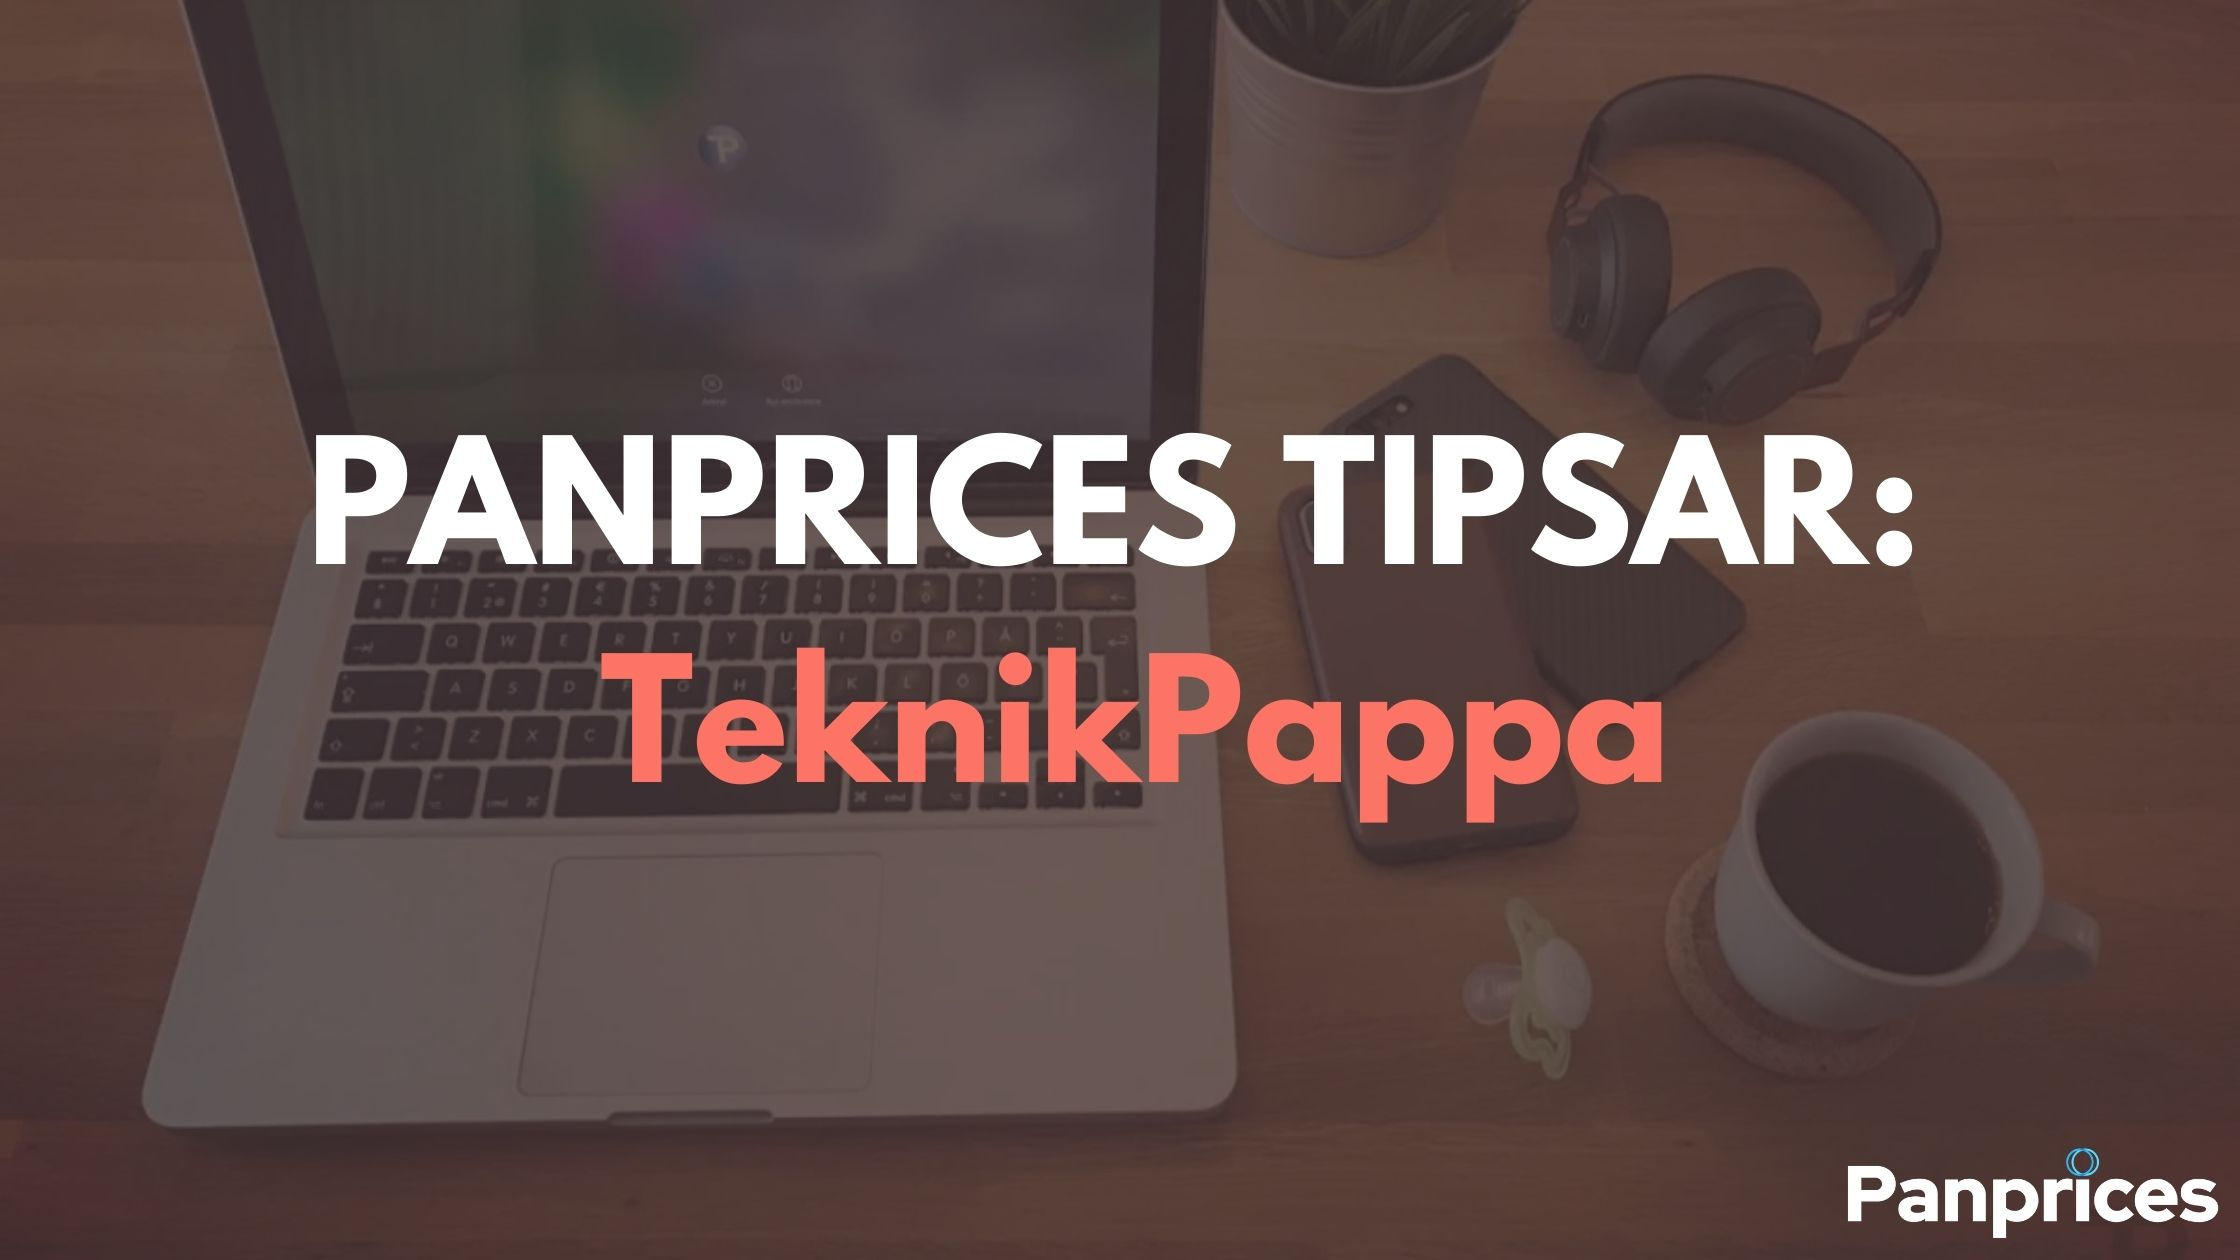 PANPRICES TIPSAR: TeknikPappa